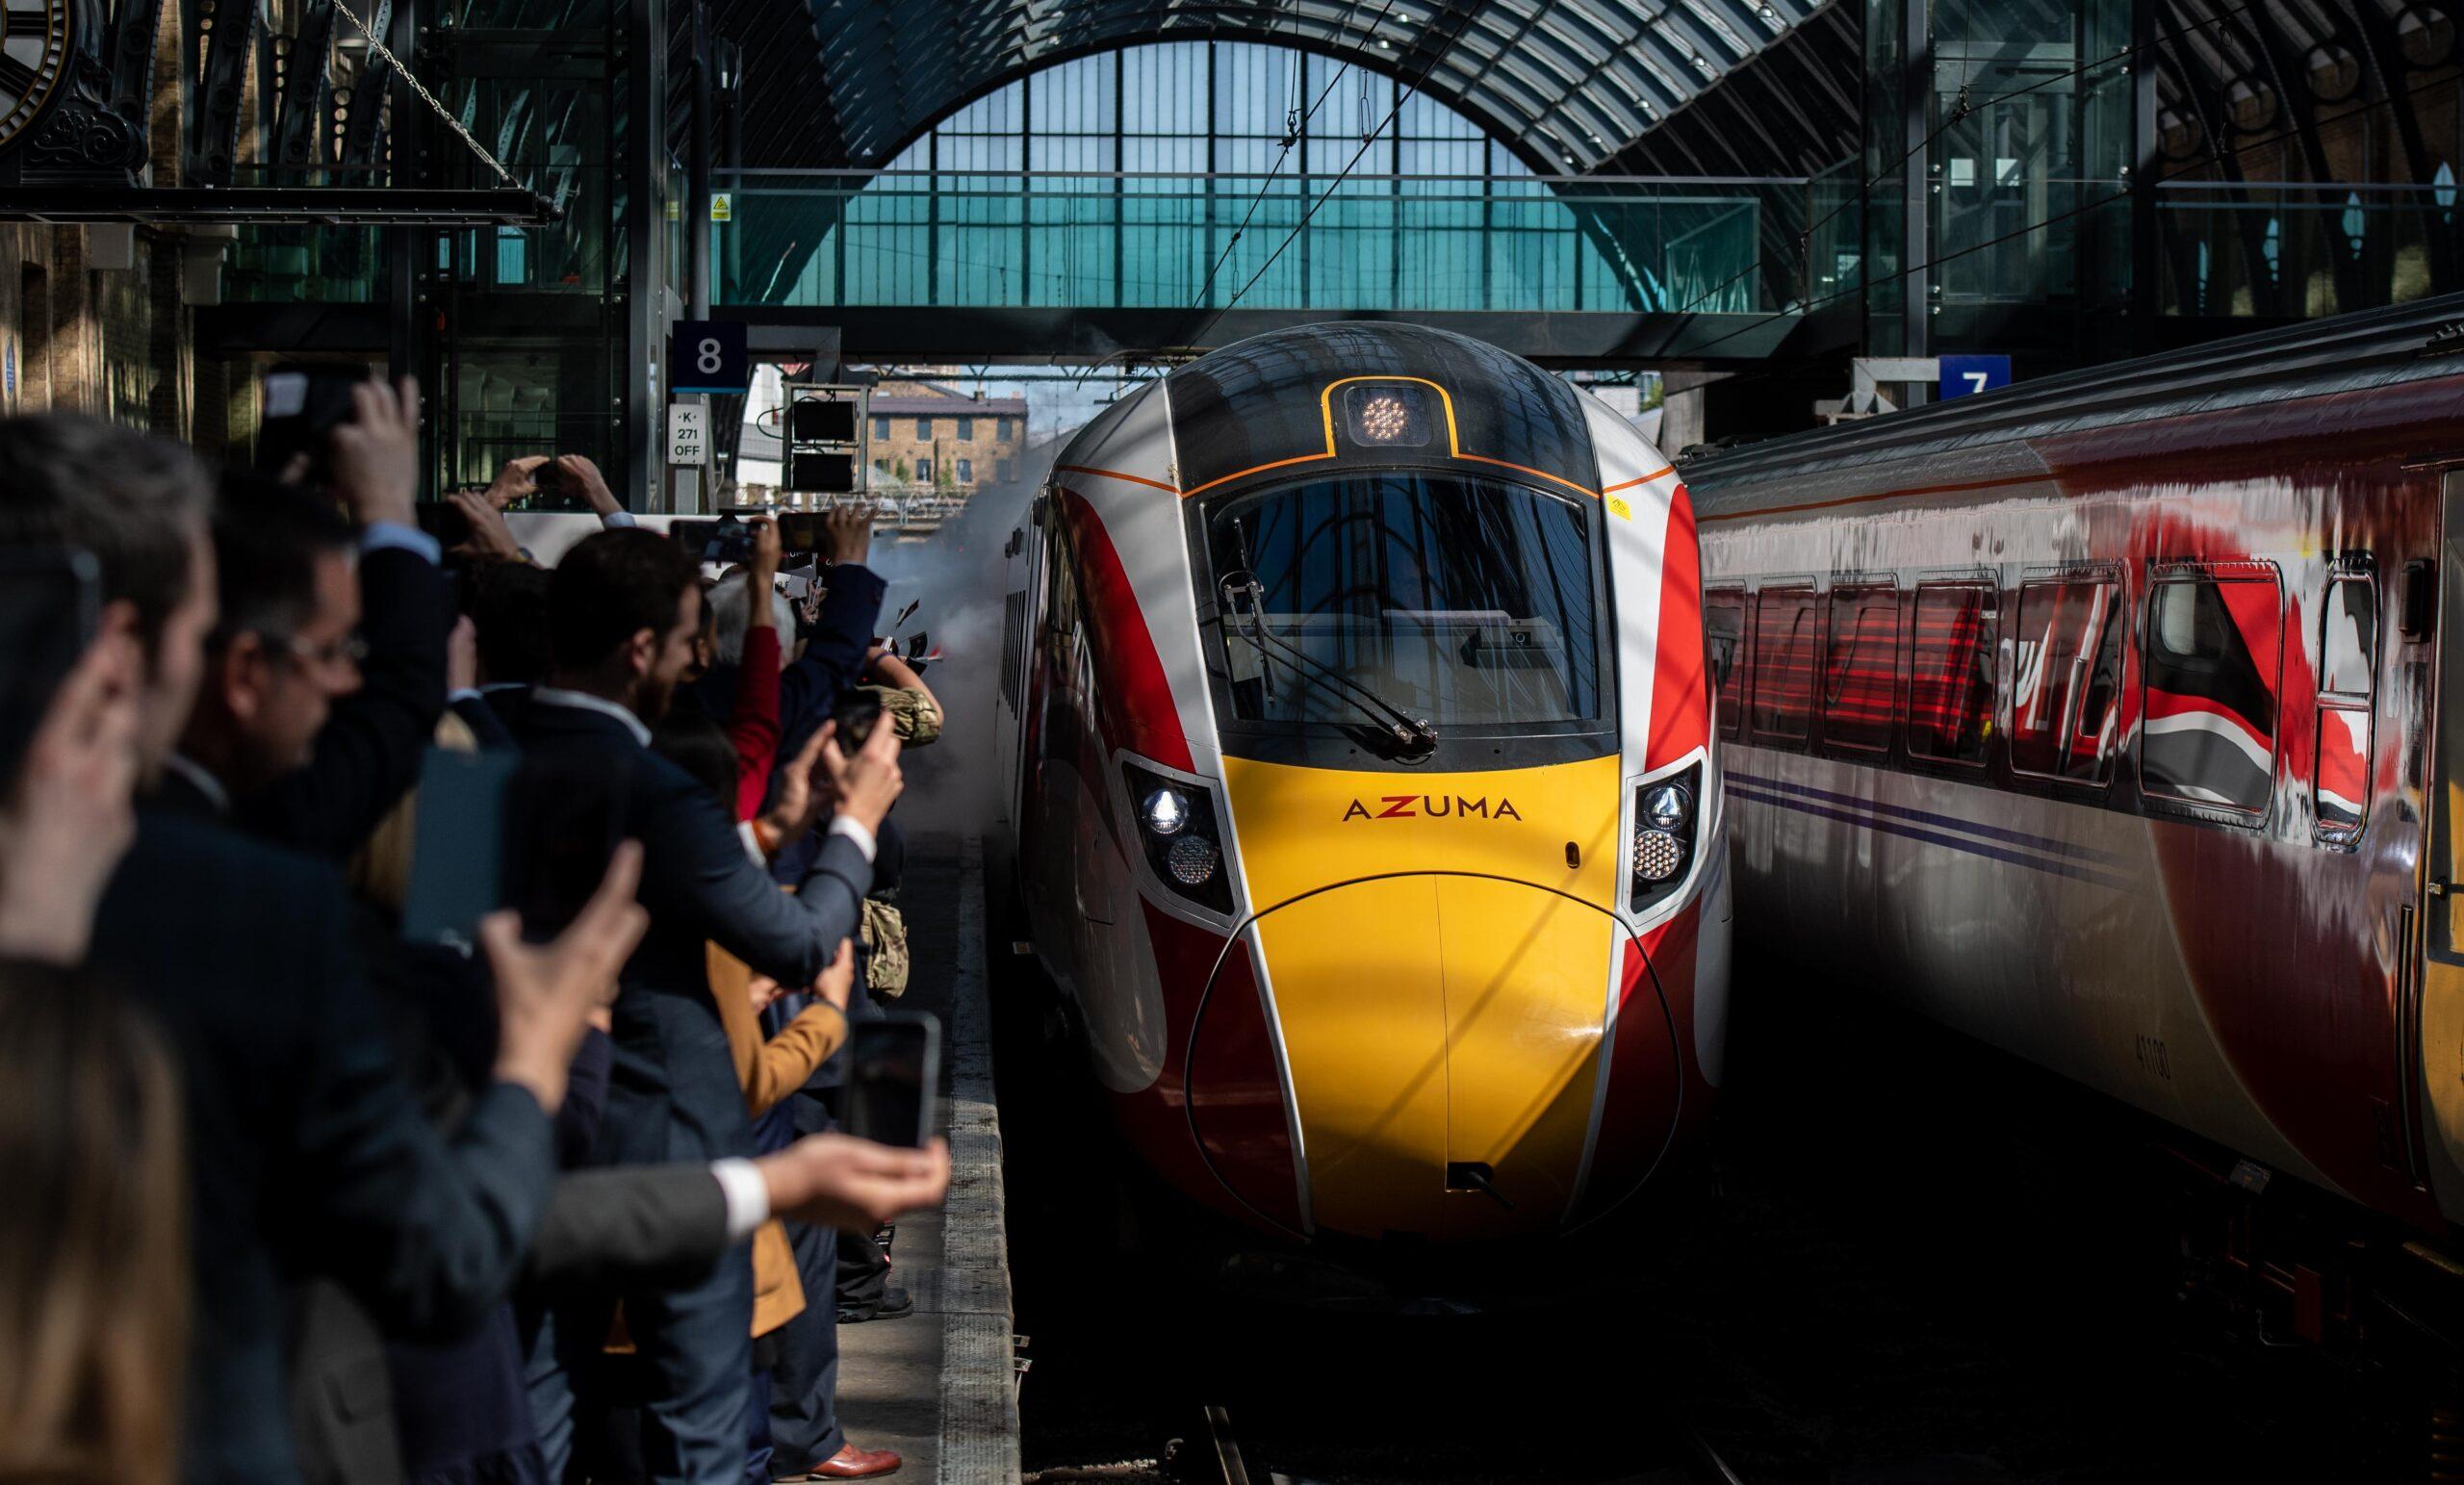 Rail revolution: Azuma launches on the East Coast